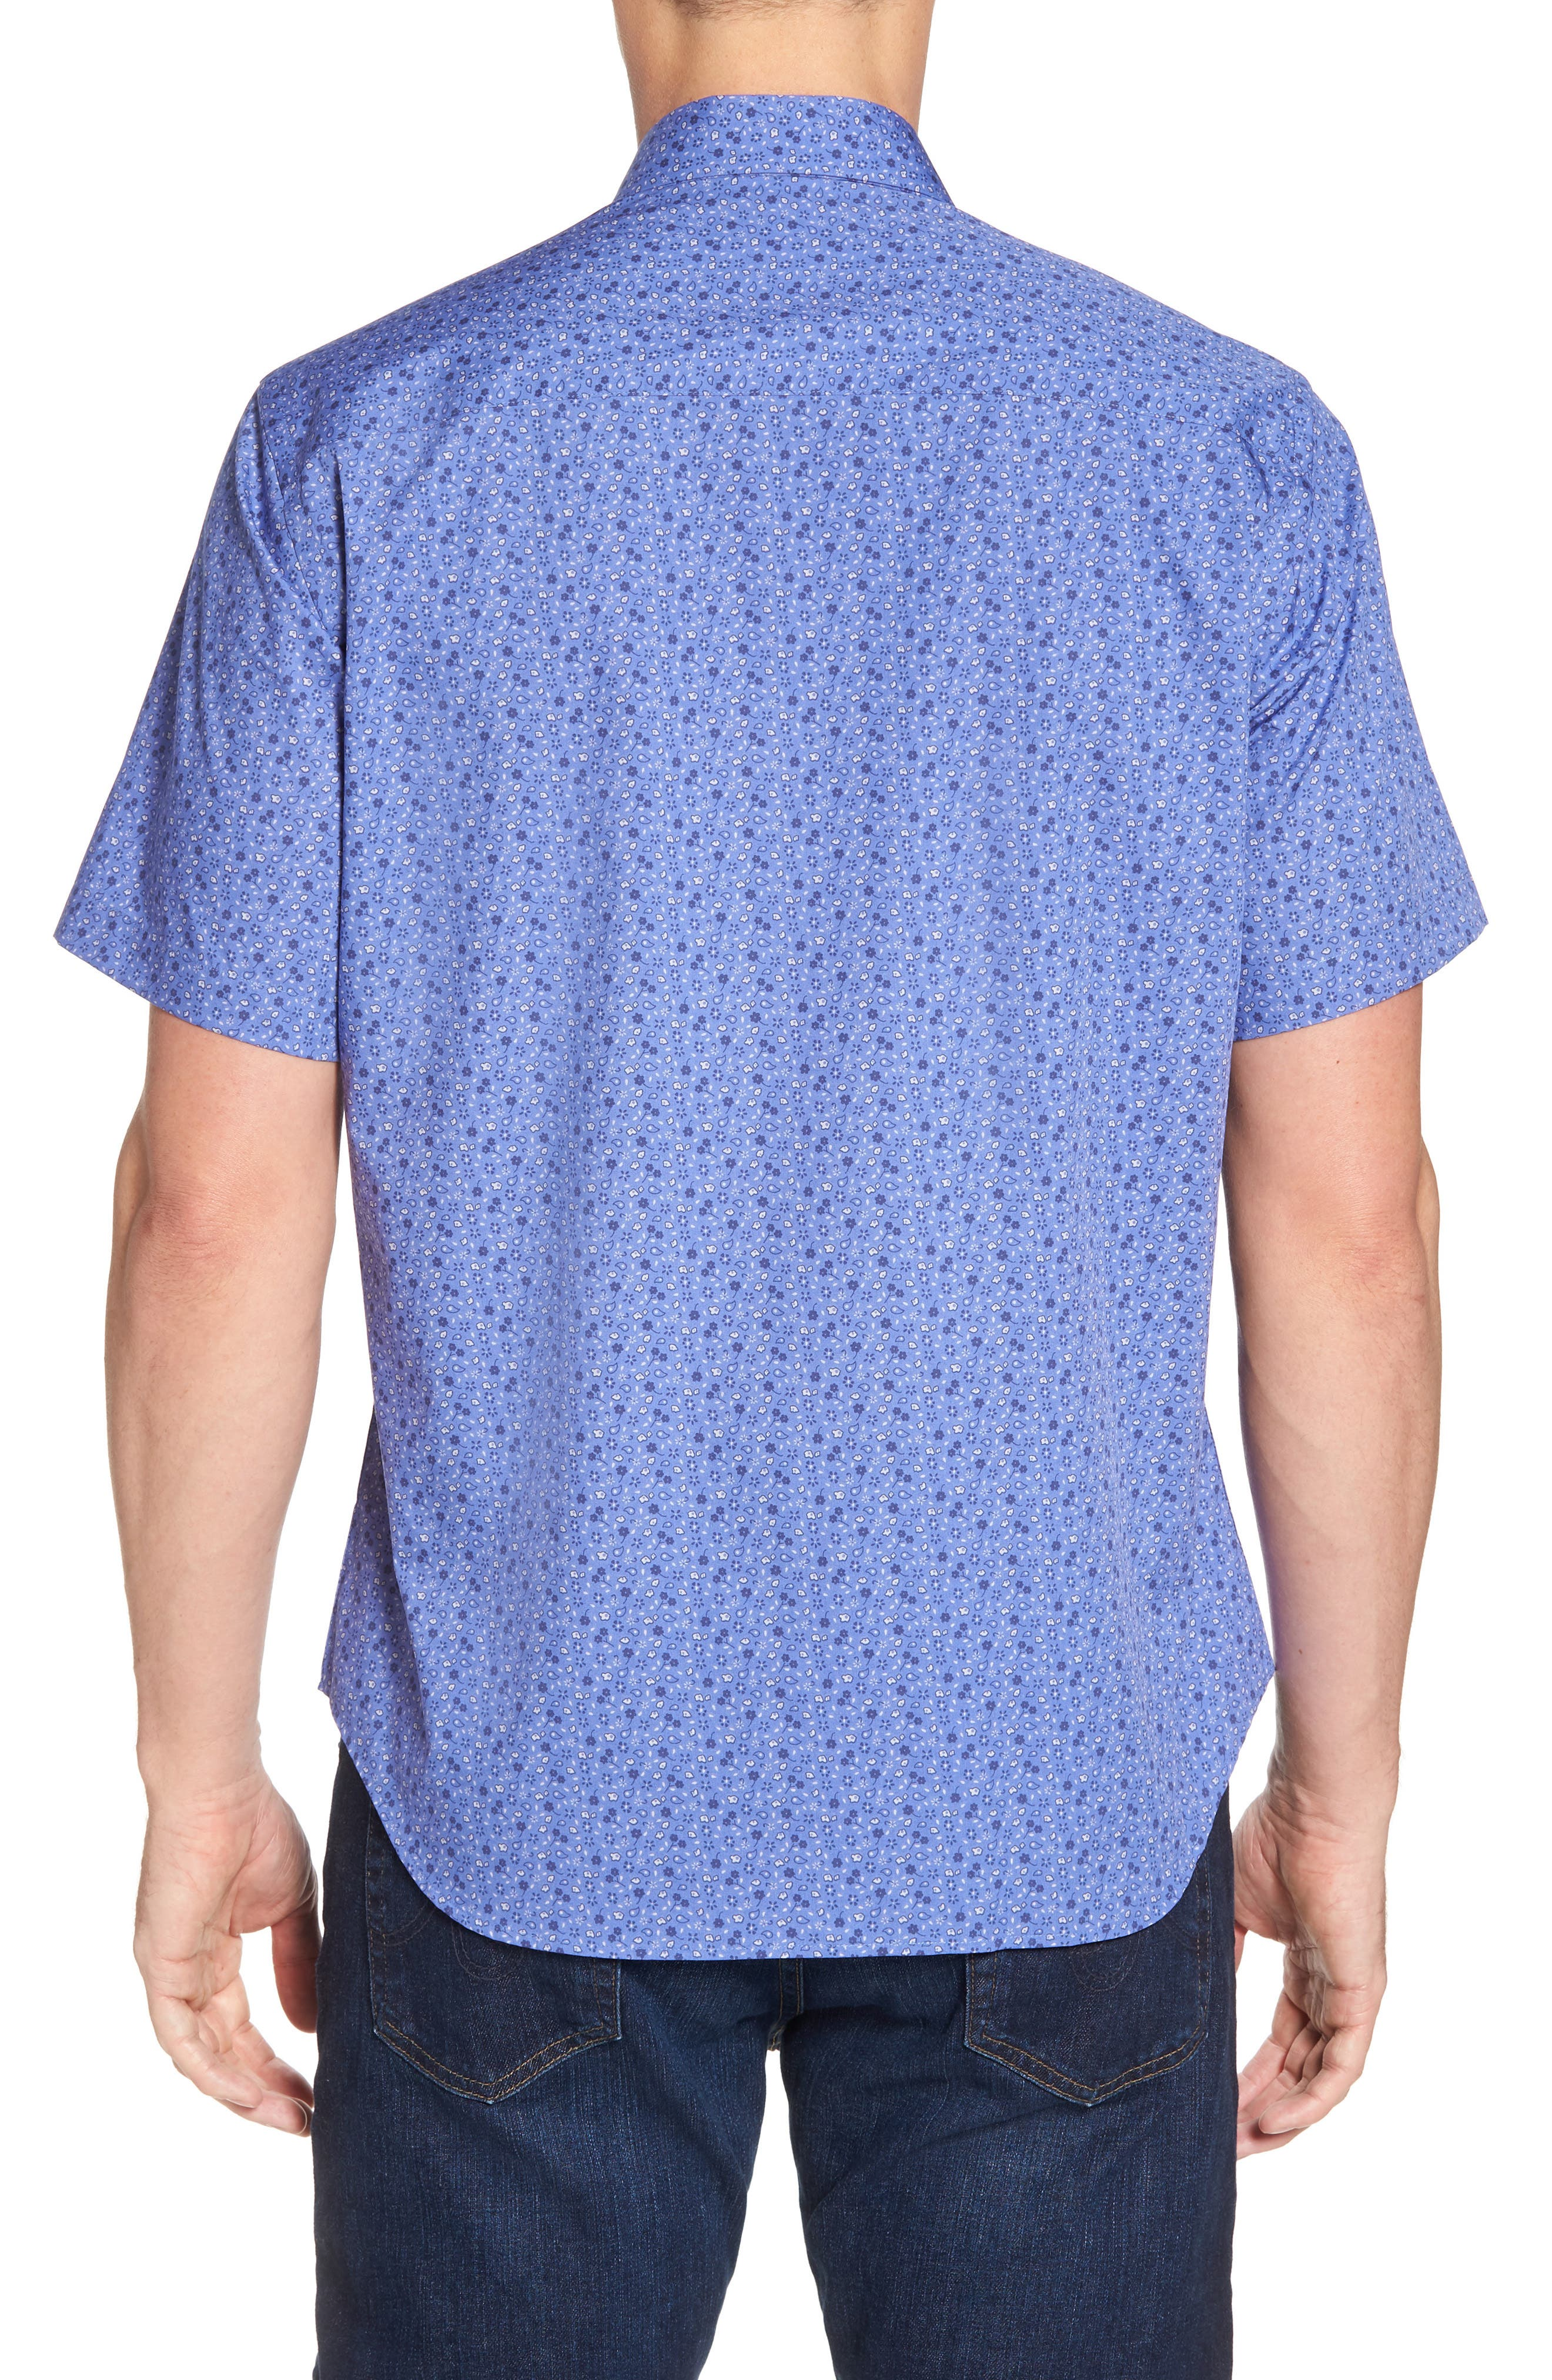 Ballou Regular Fit Floral Print Sport Shirt,                             Alternate thumbnail 2, color,                             430